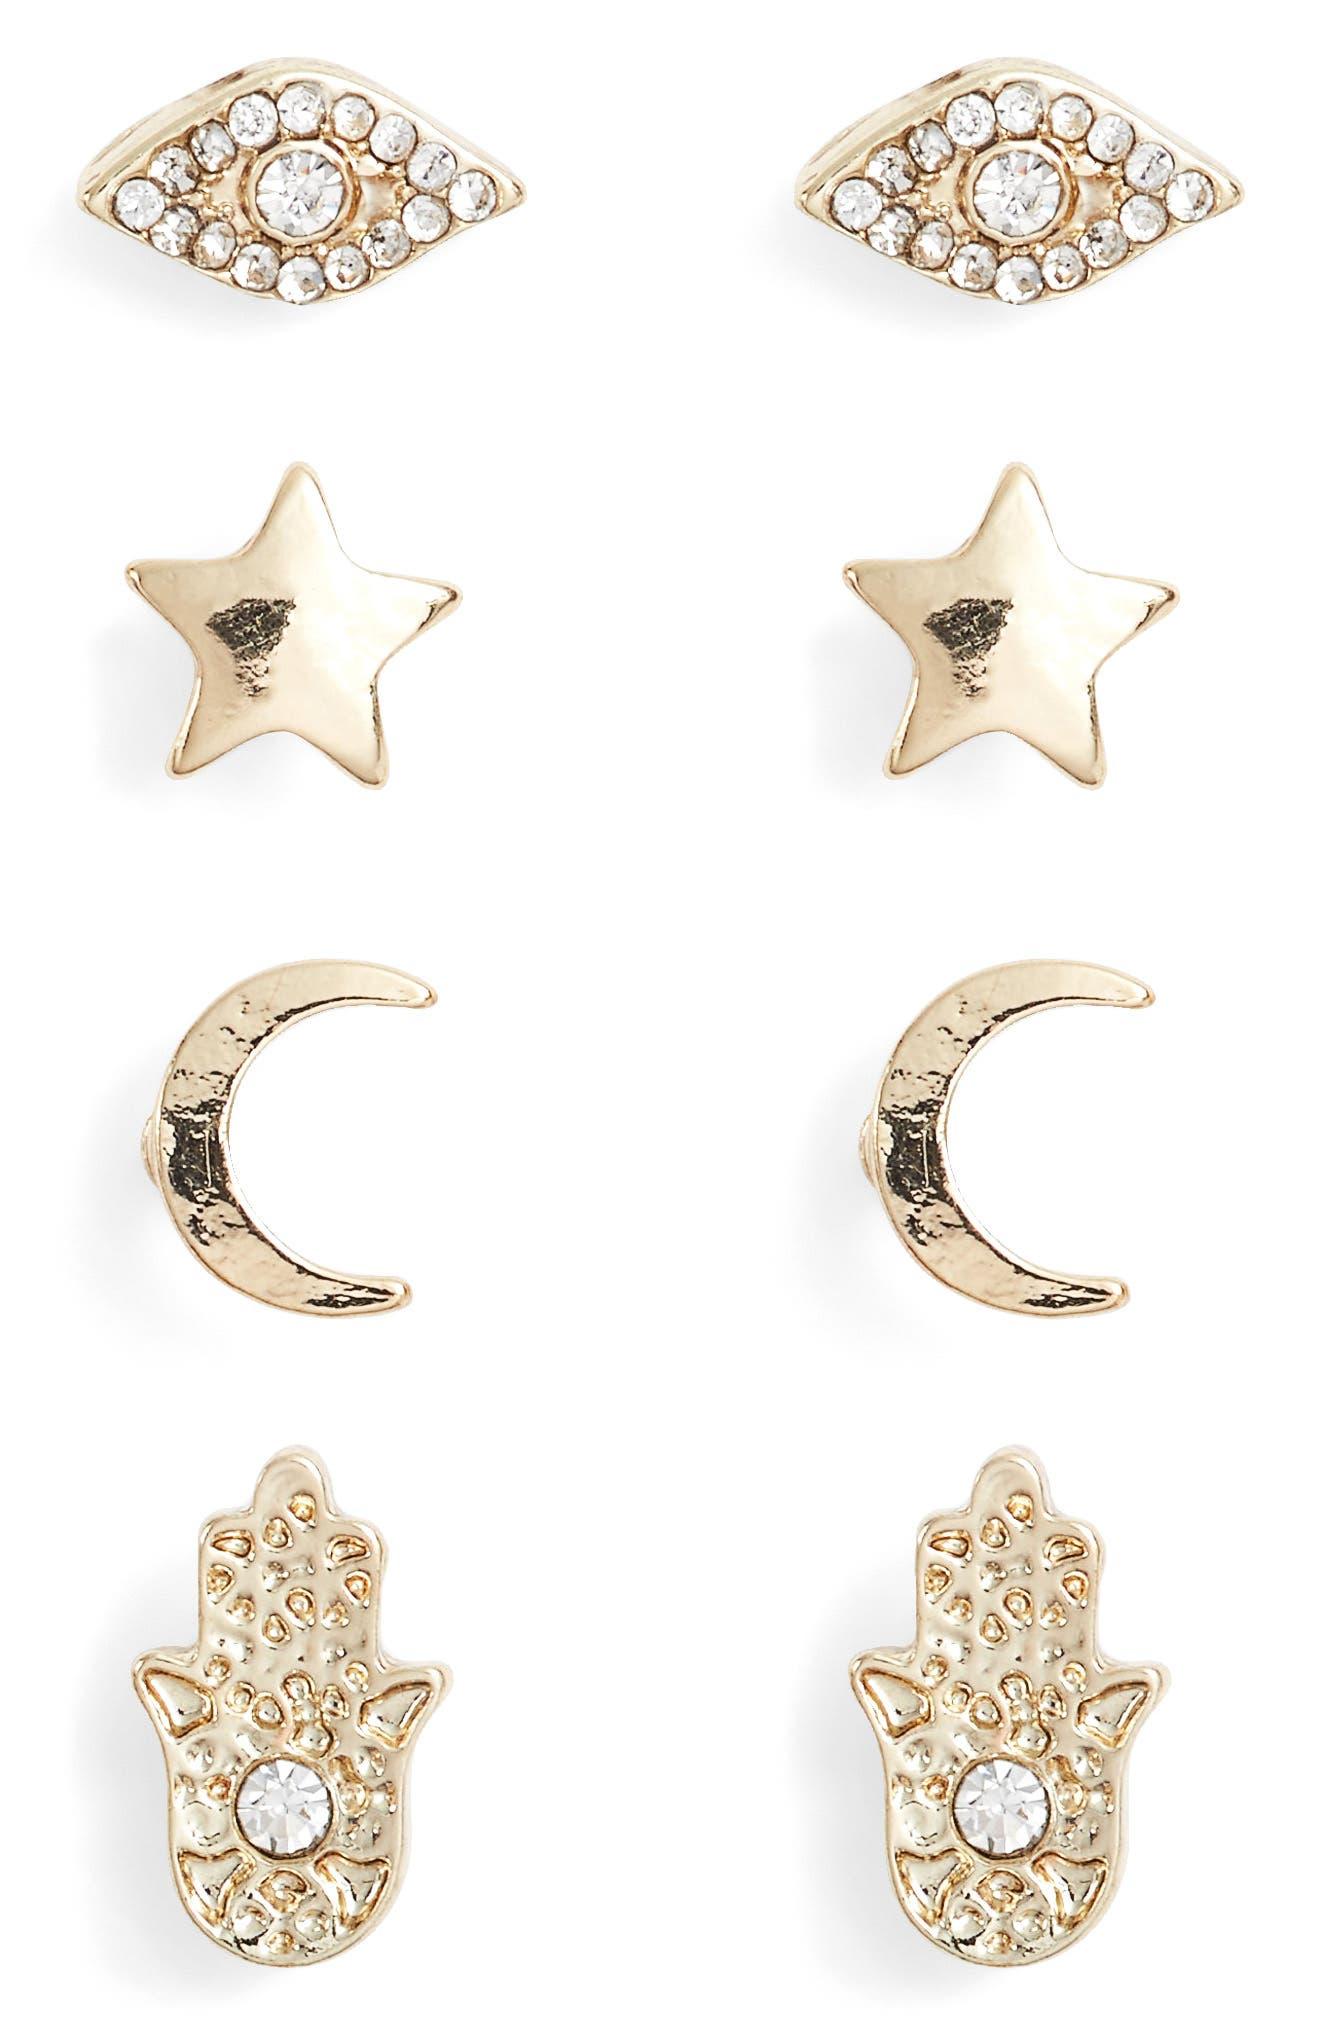 Main Image - Ettika Set of 4 Stud Earrings